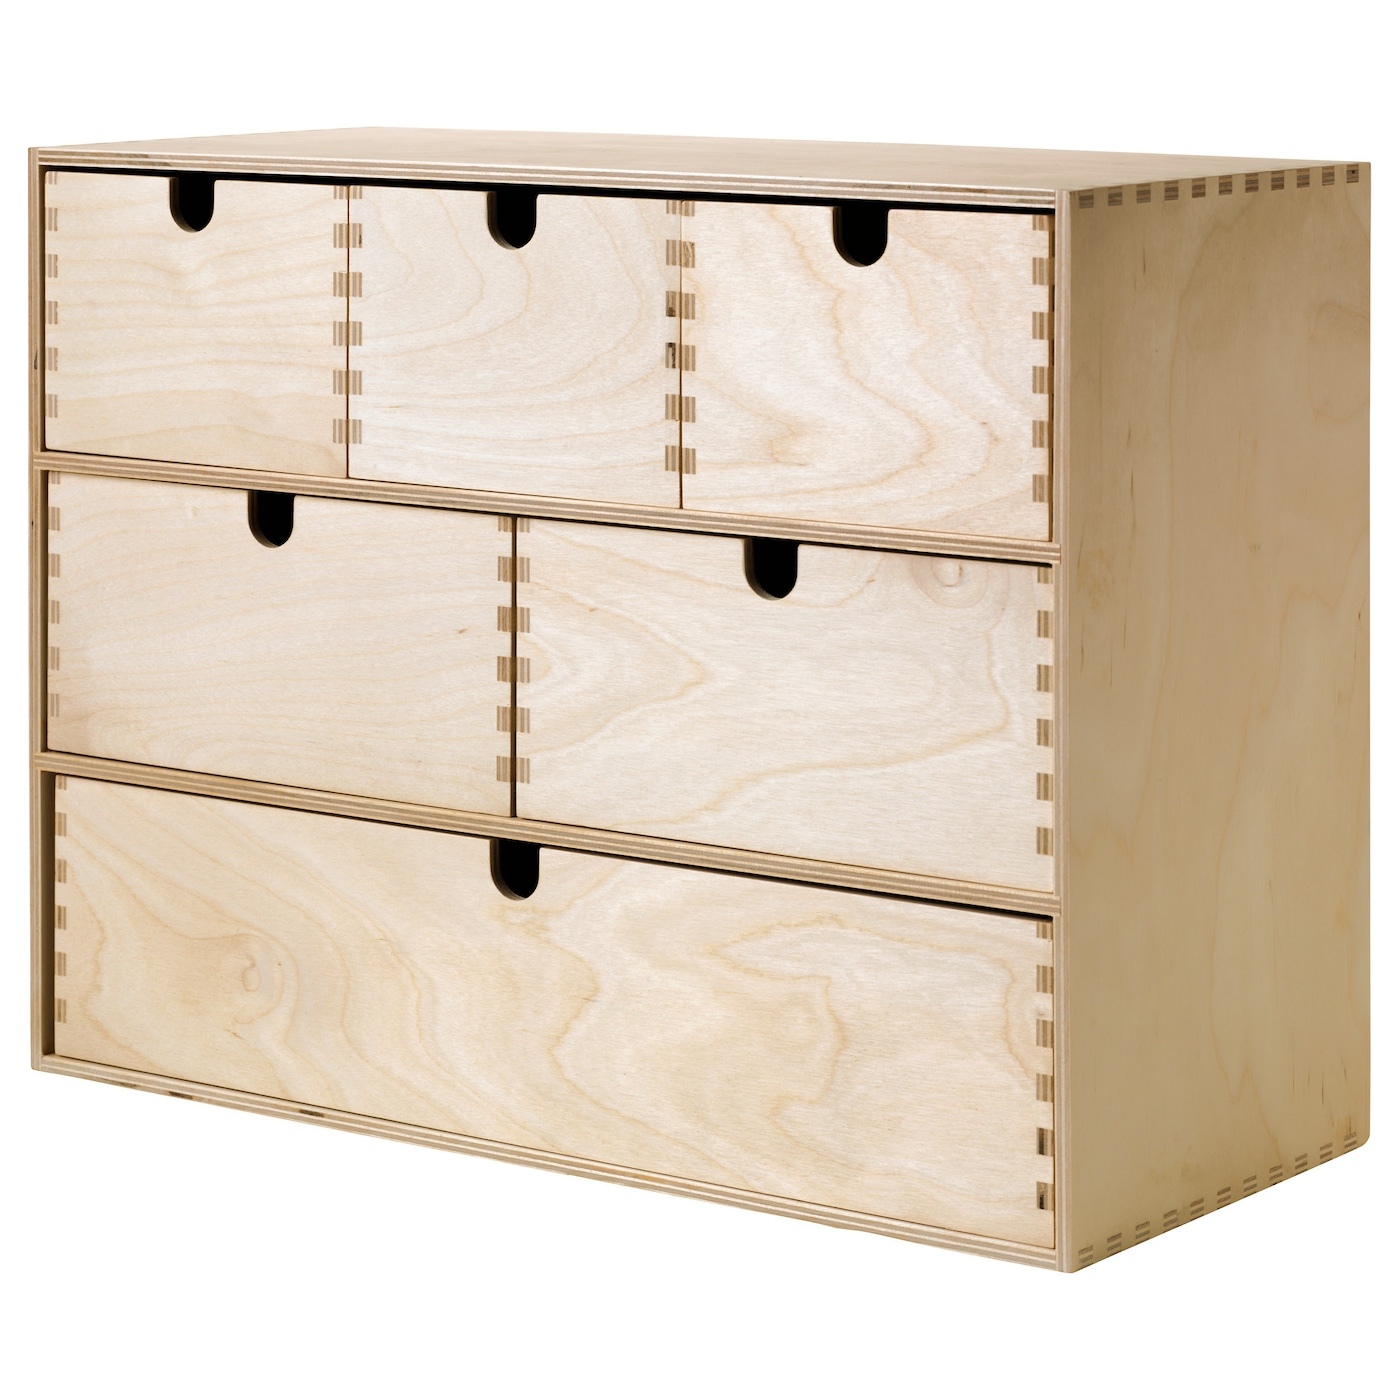 moppe mini komoda katalog 2016 n bytek online. Black Bedroom Furniture Sets. Home Design Ideas